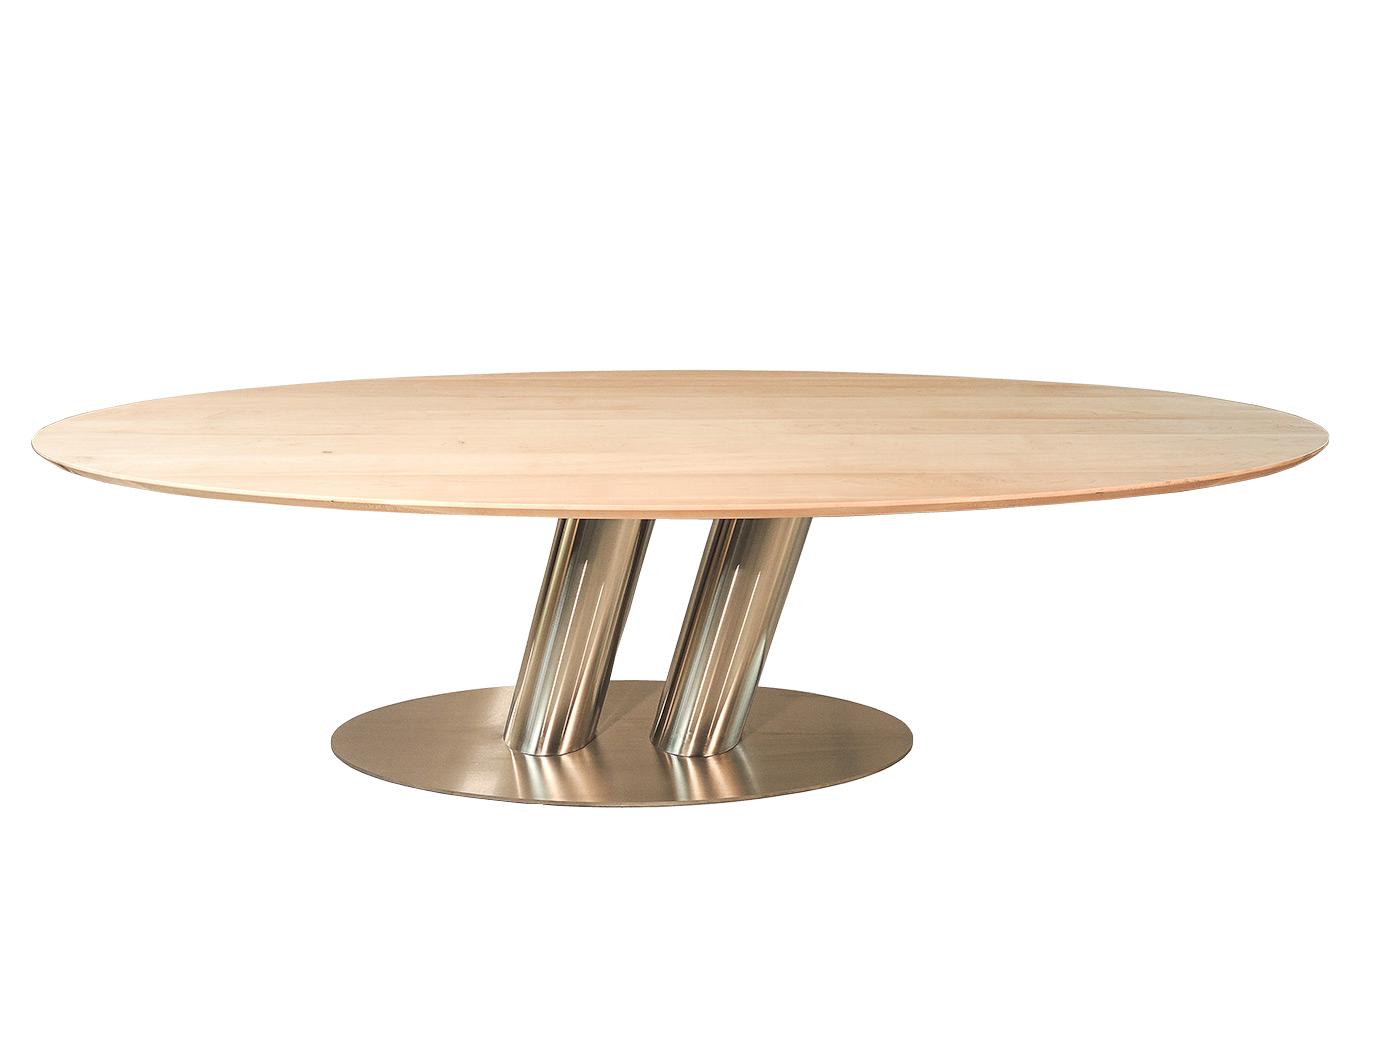 Moderne Grote Eettafel.Puglia 10 Persoons Ovale Eettafel